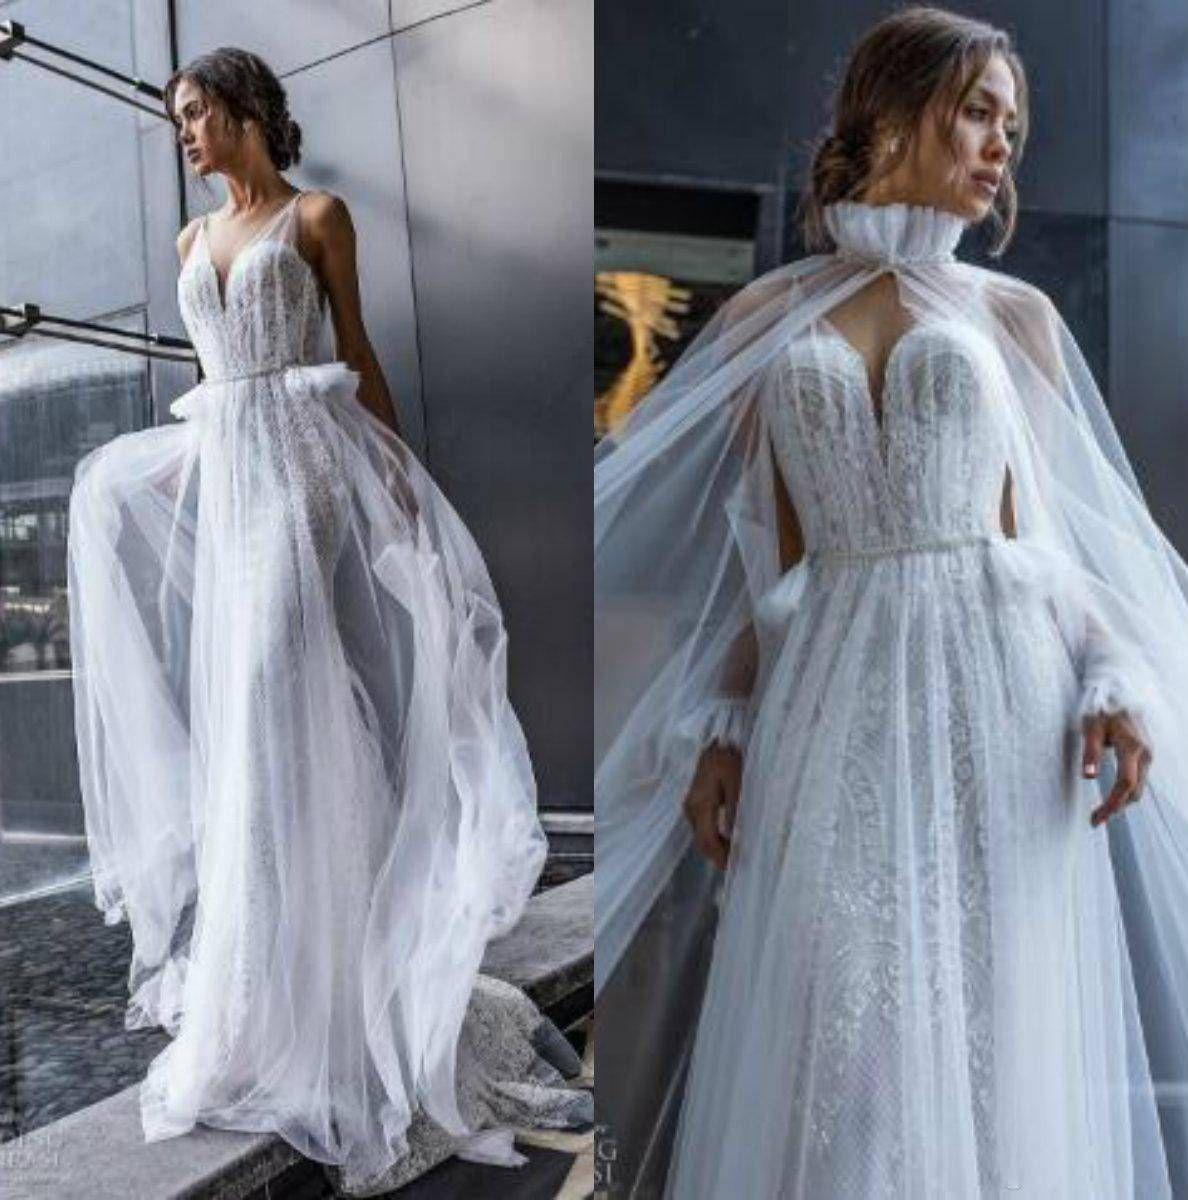 Discount Dimitrius Dalia 2018 Wedding Dresses With Free Cape V Neck Arabic  Lace Appliques Beach Wedding Dress Plus Size Lace Ball Gown Wedding Dresse  Plus ... 4e22094b69d8